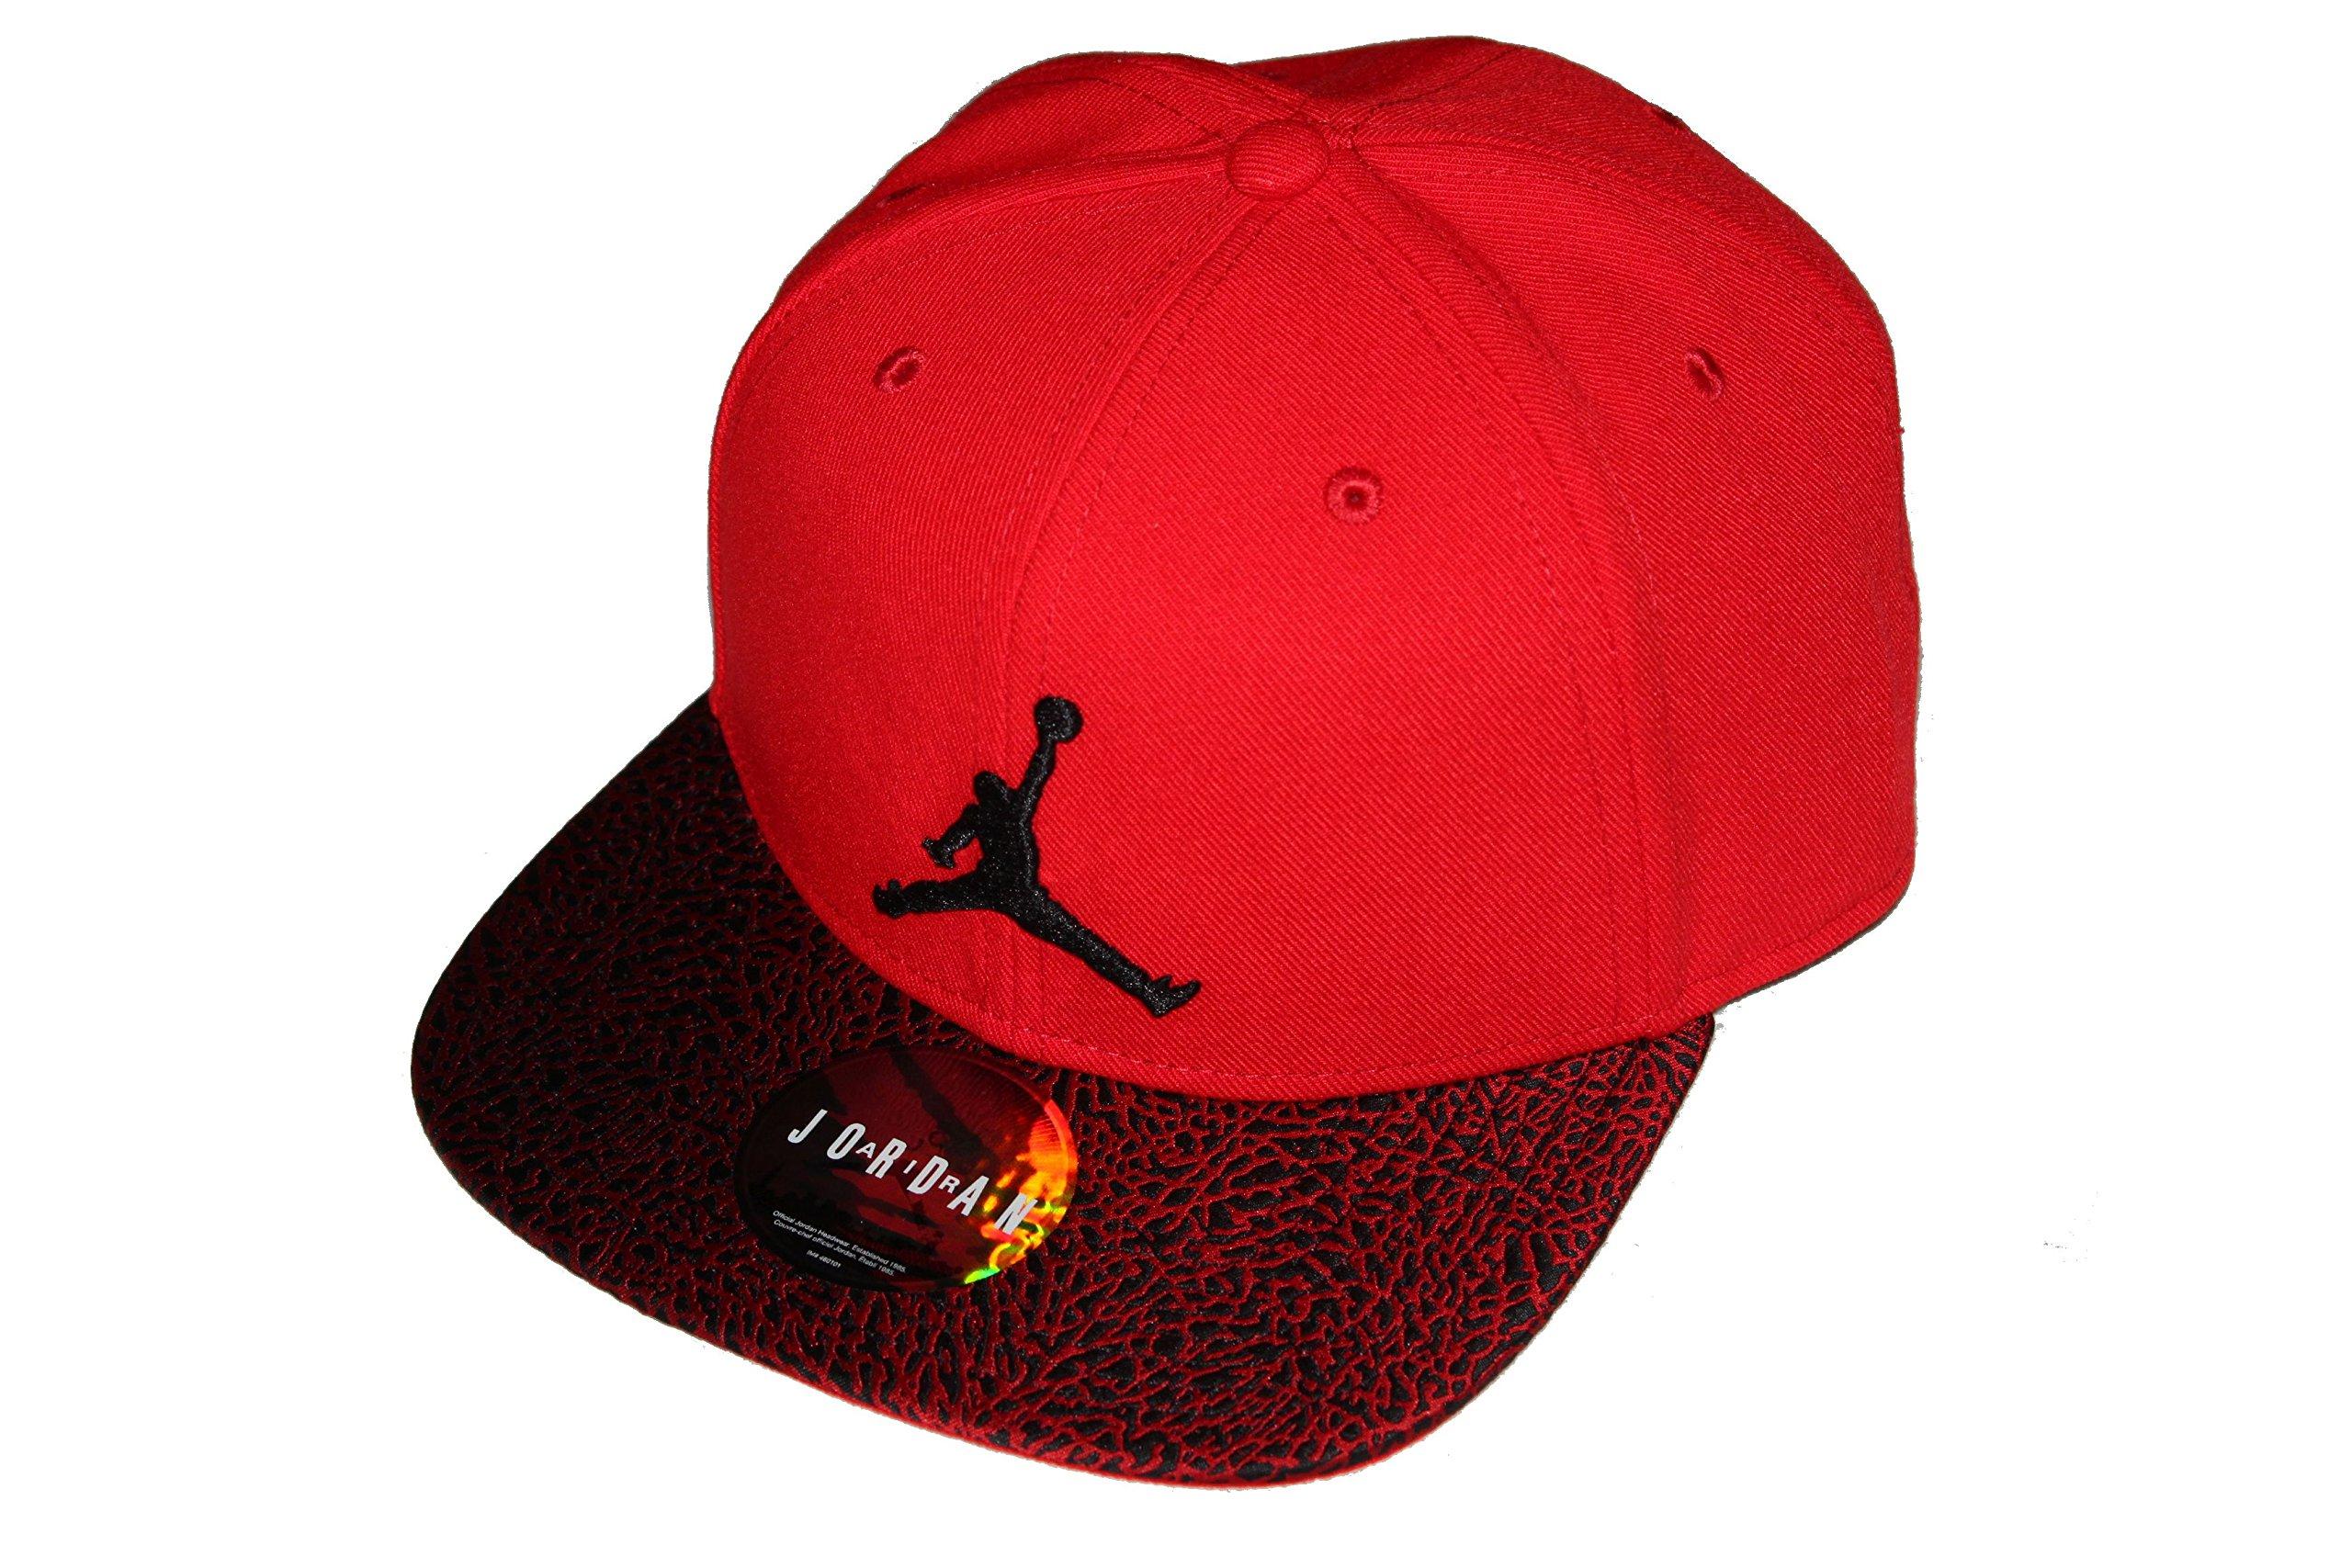 4db15979e7e7c Nike Mens Air Jordan Elephant Bill Snapback Hat Gym Red Black 834891-657